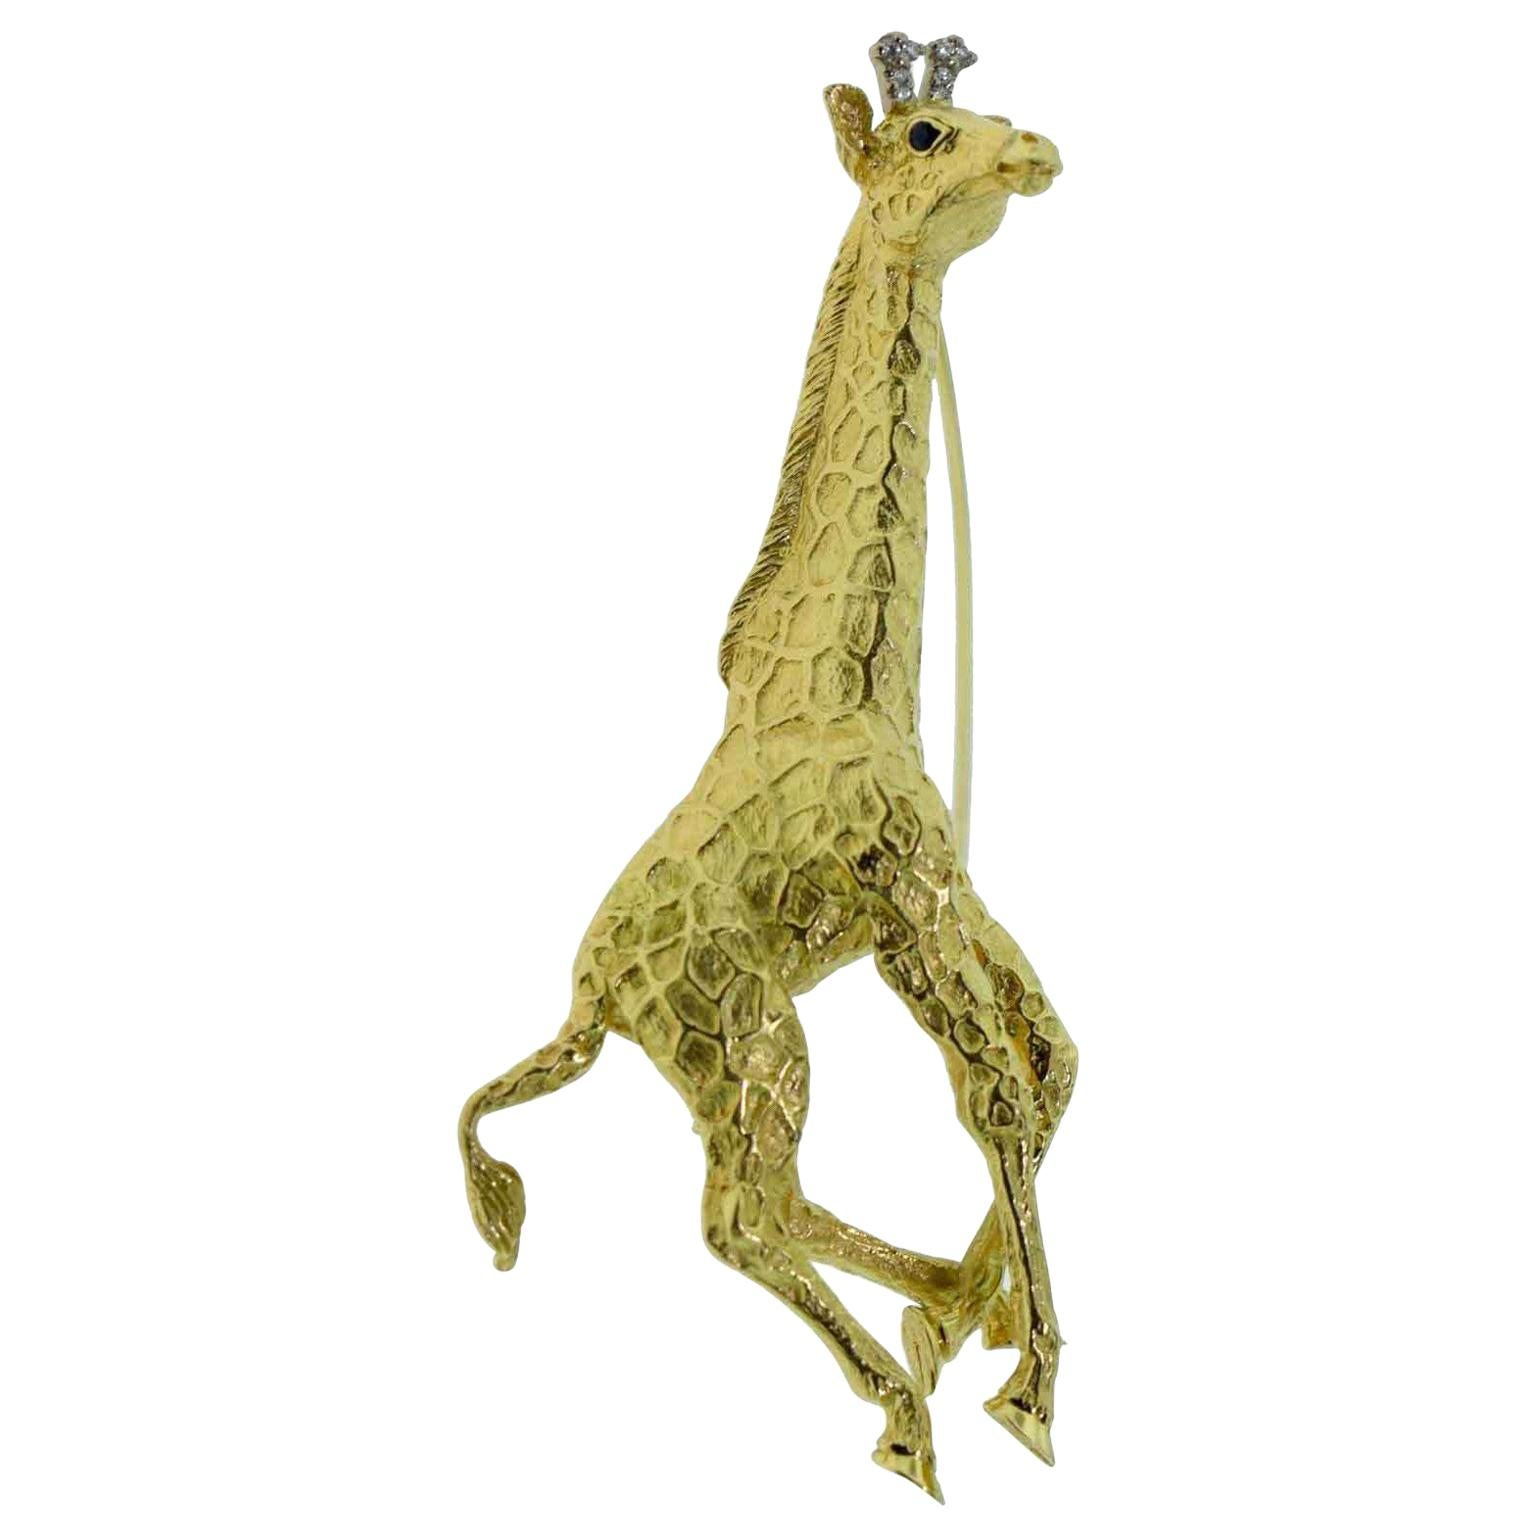 Tiffany & Co. Yellow Gold Diamond and Sapphire Giraffe Brooch Pin, 1991